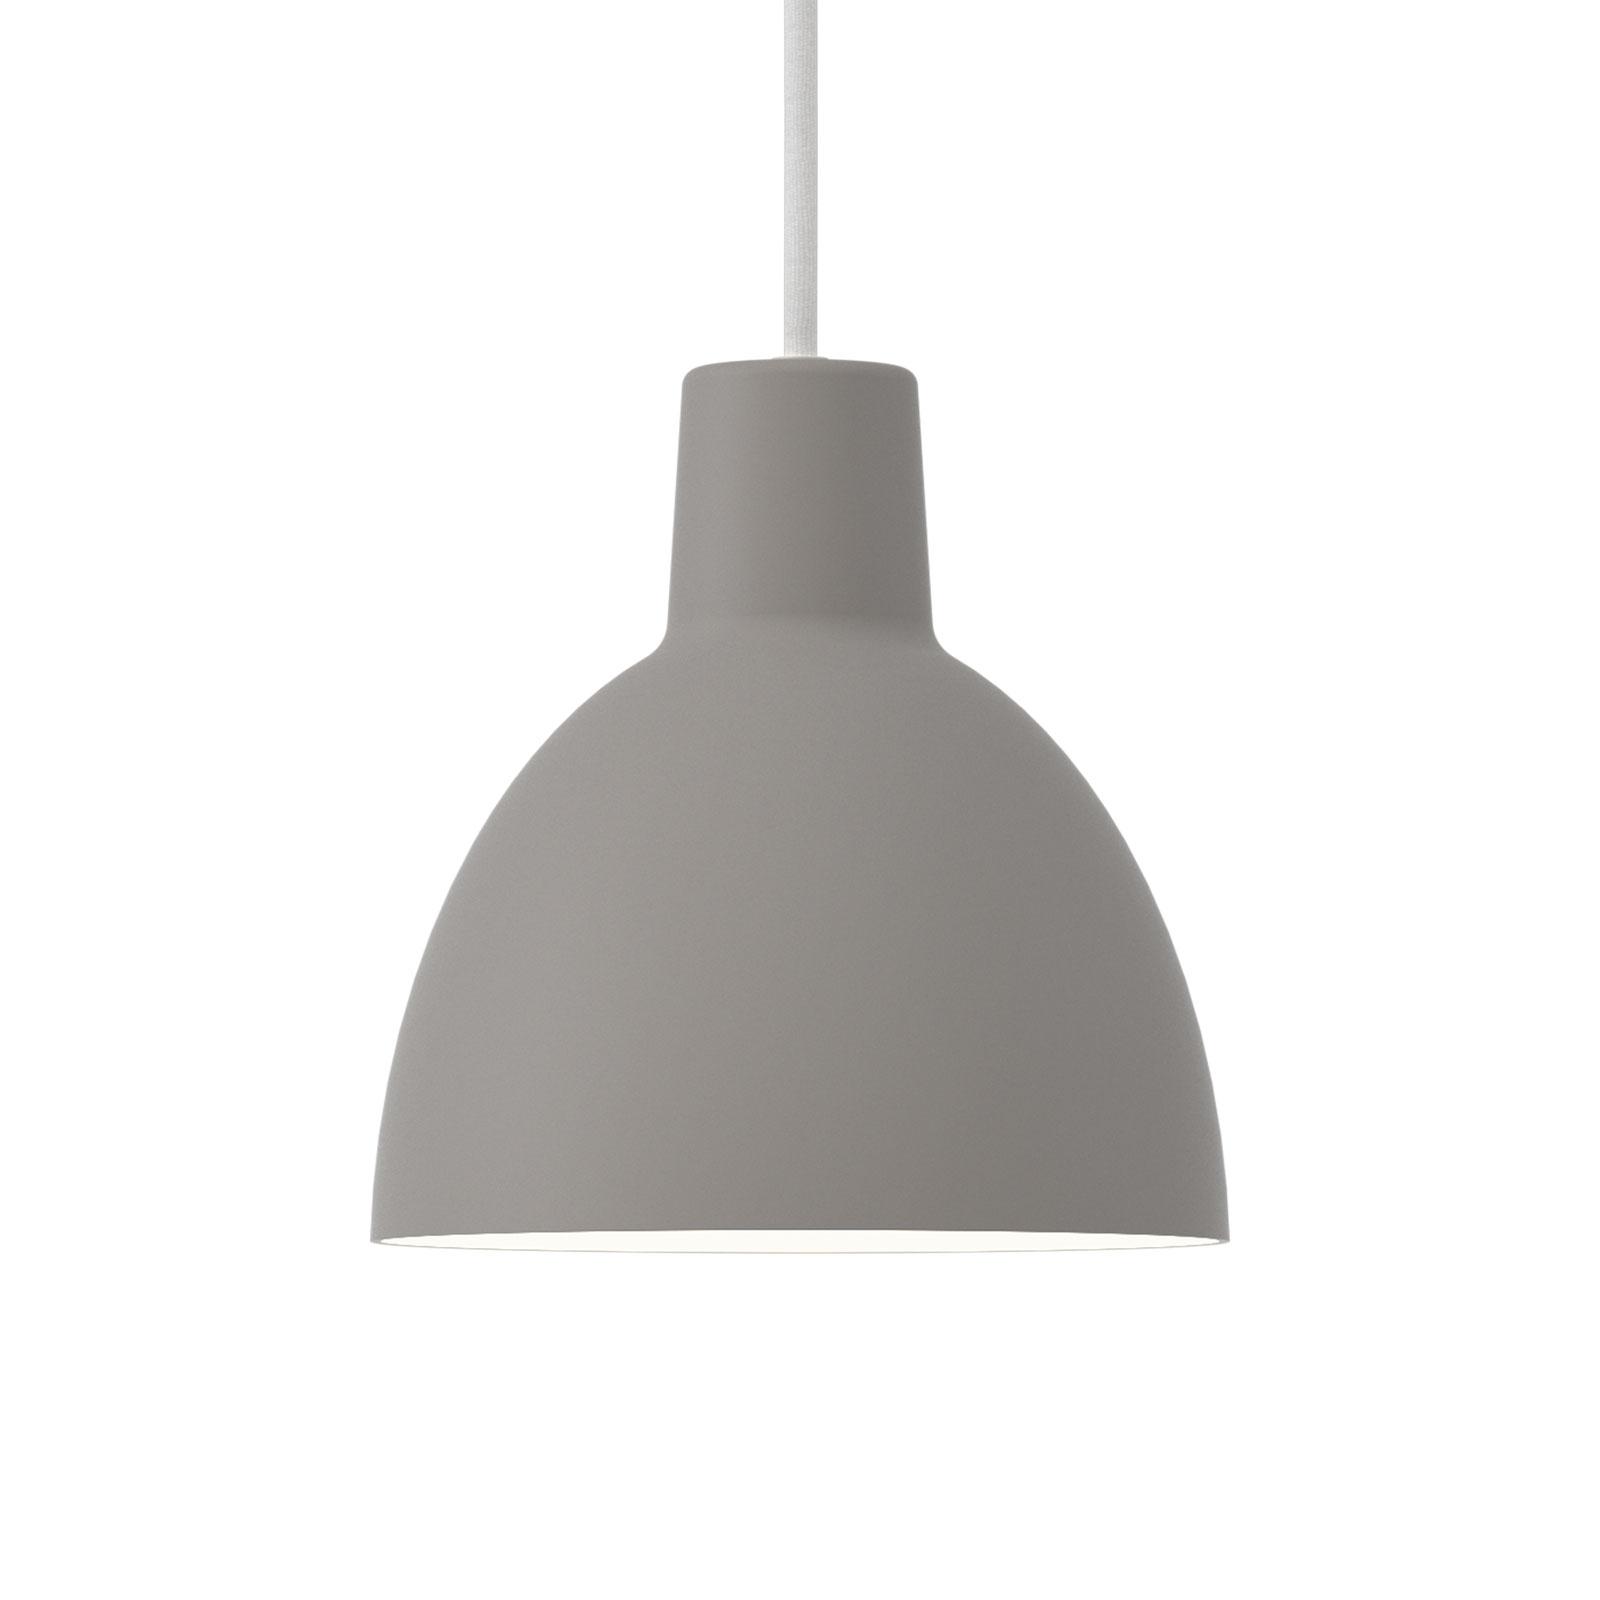 Louis Poulsen hanglamp Toldbod 170, lichtgrijs